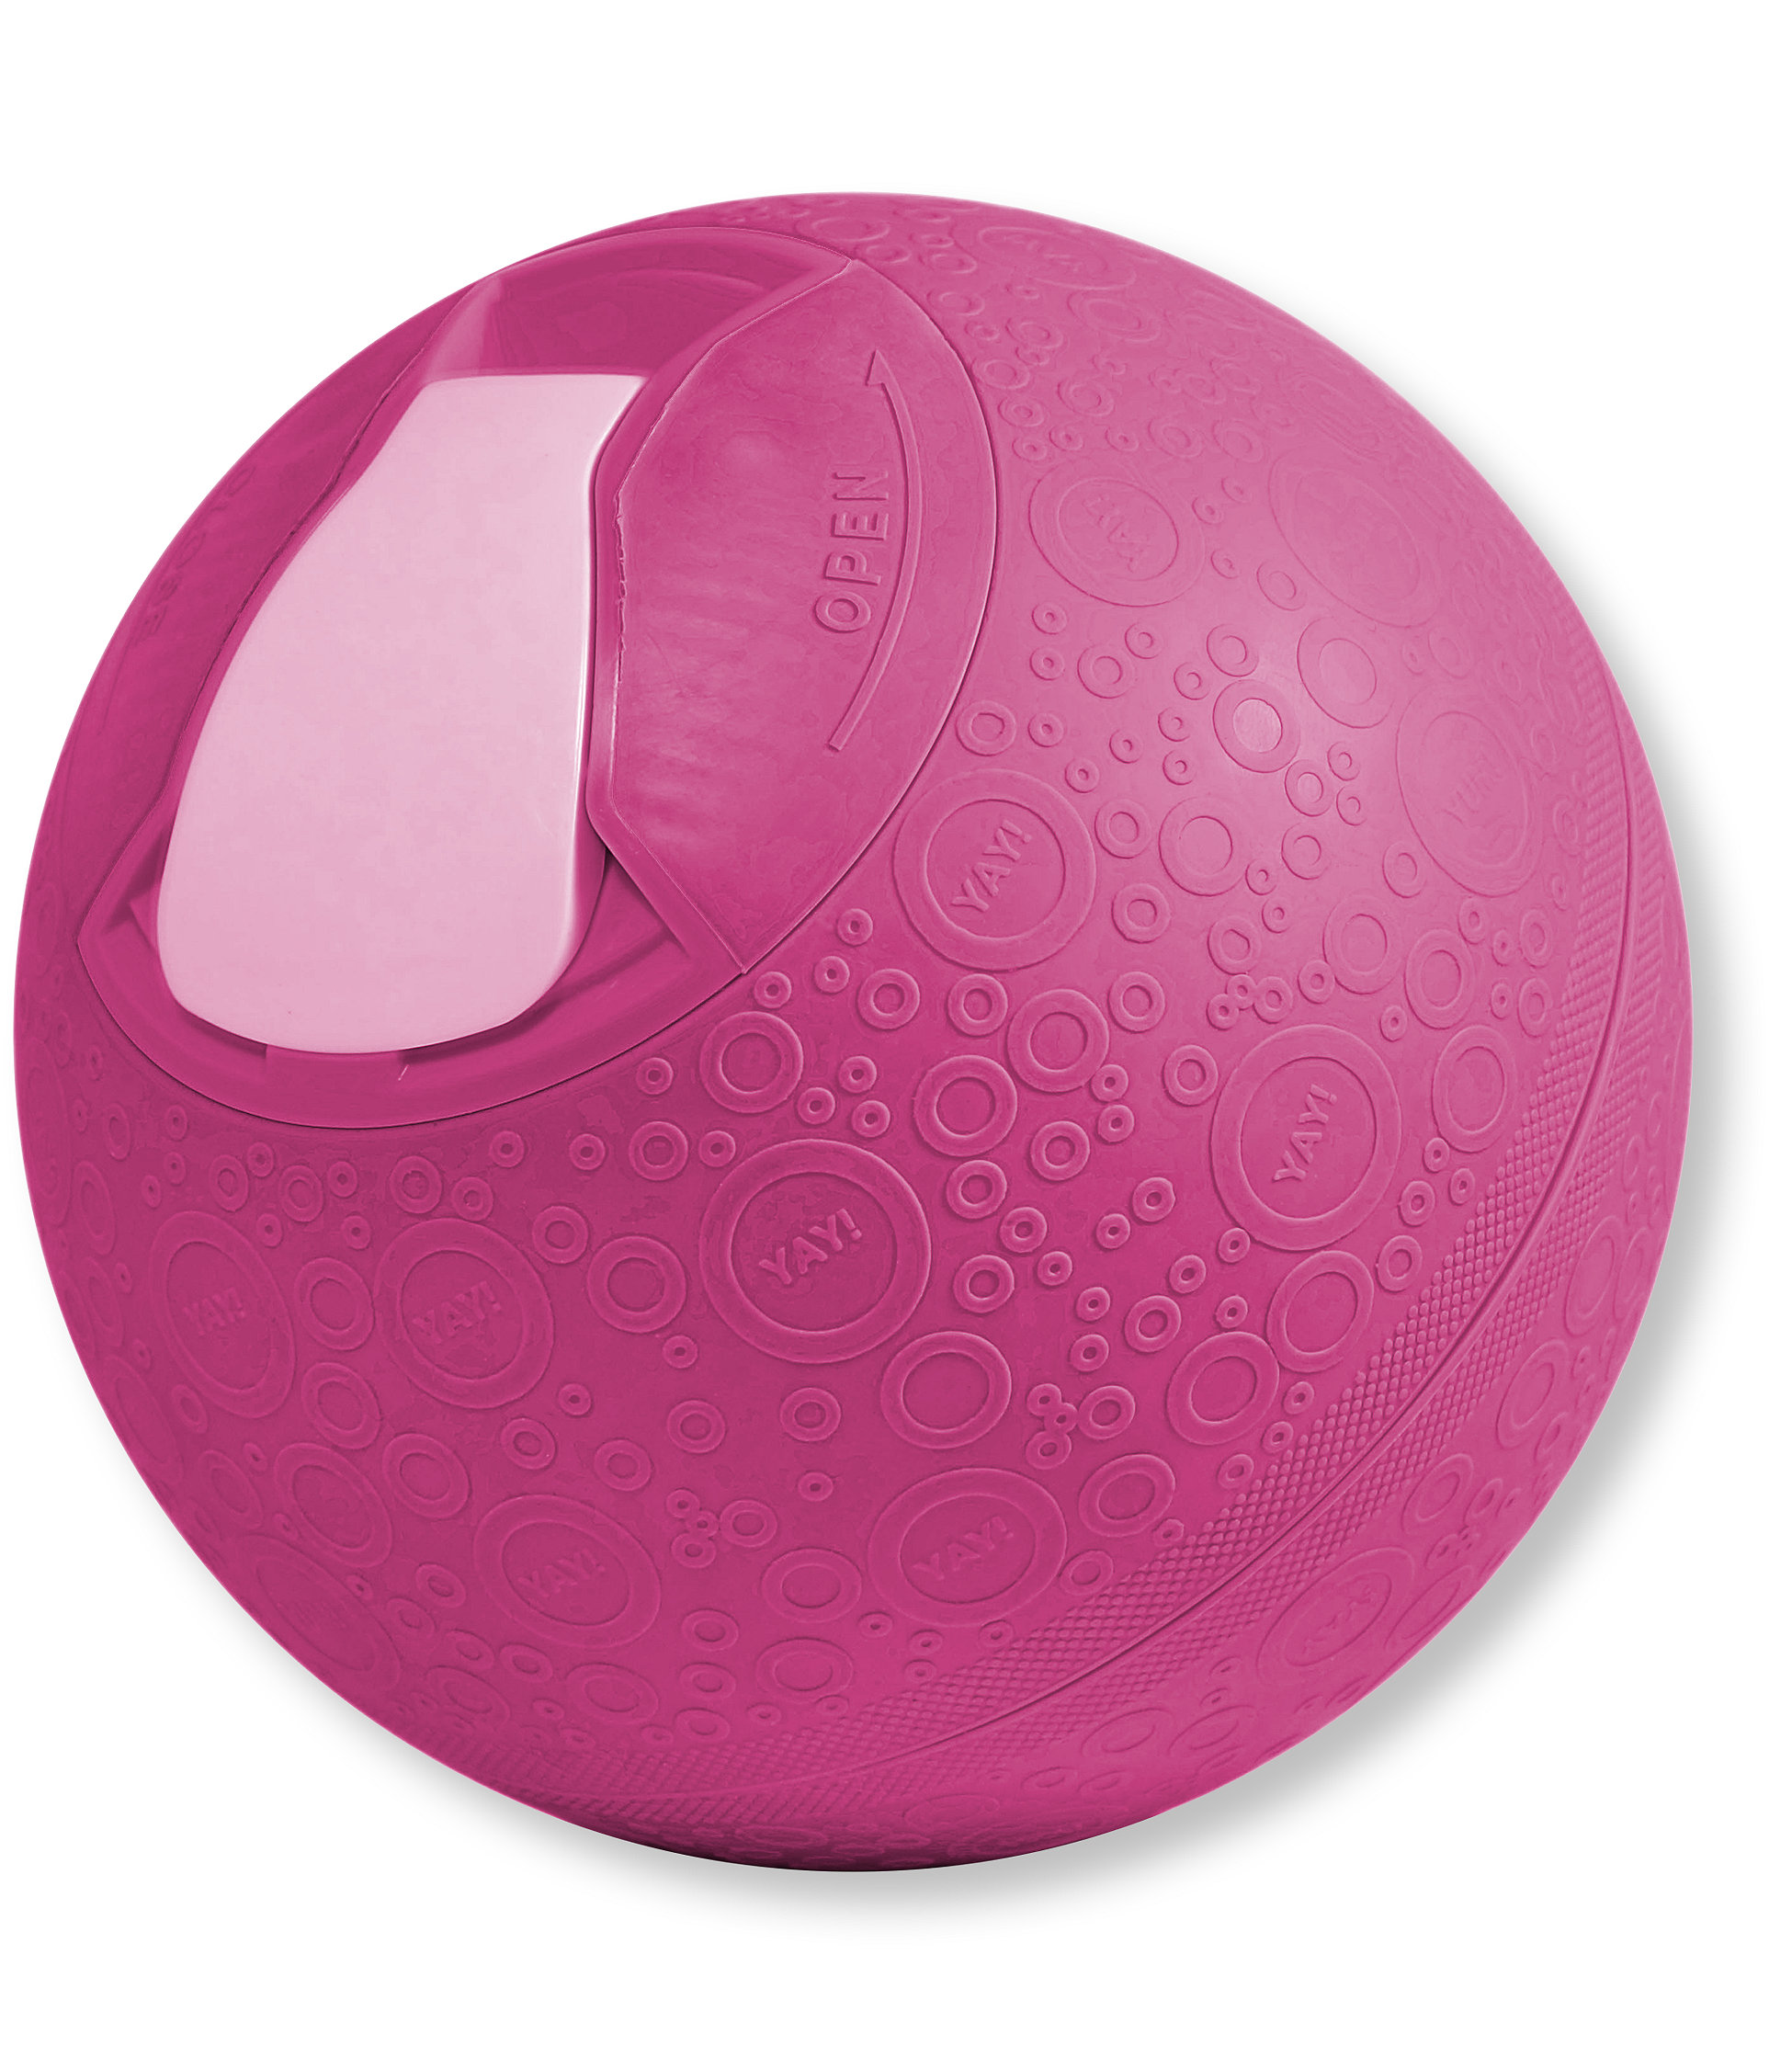 UCO Soft-Shell Ice Cream Ball